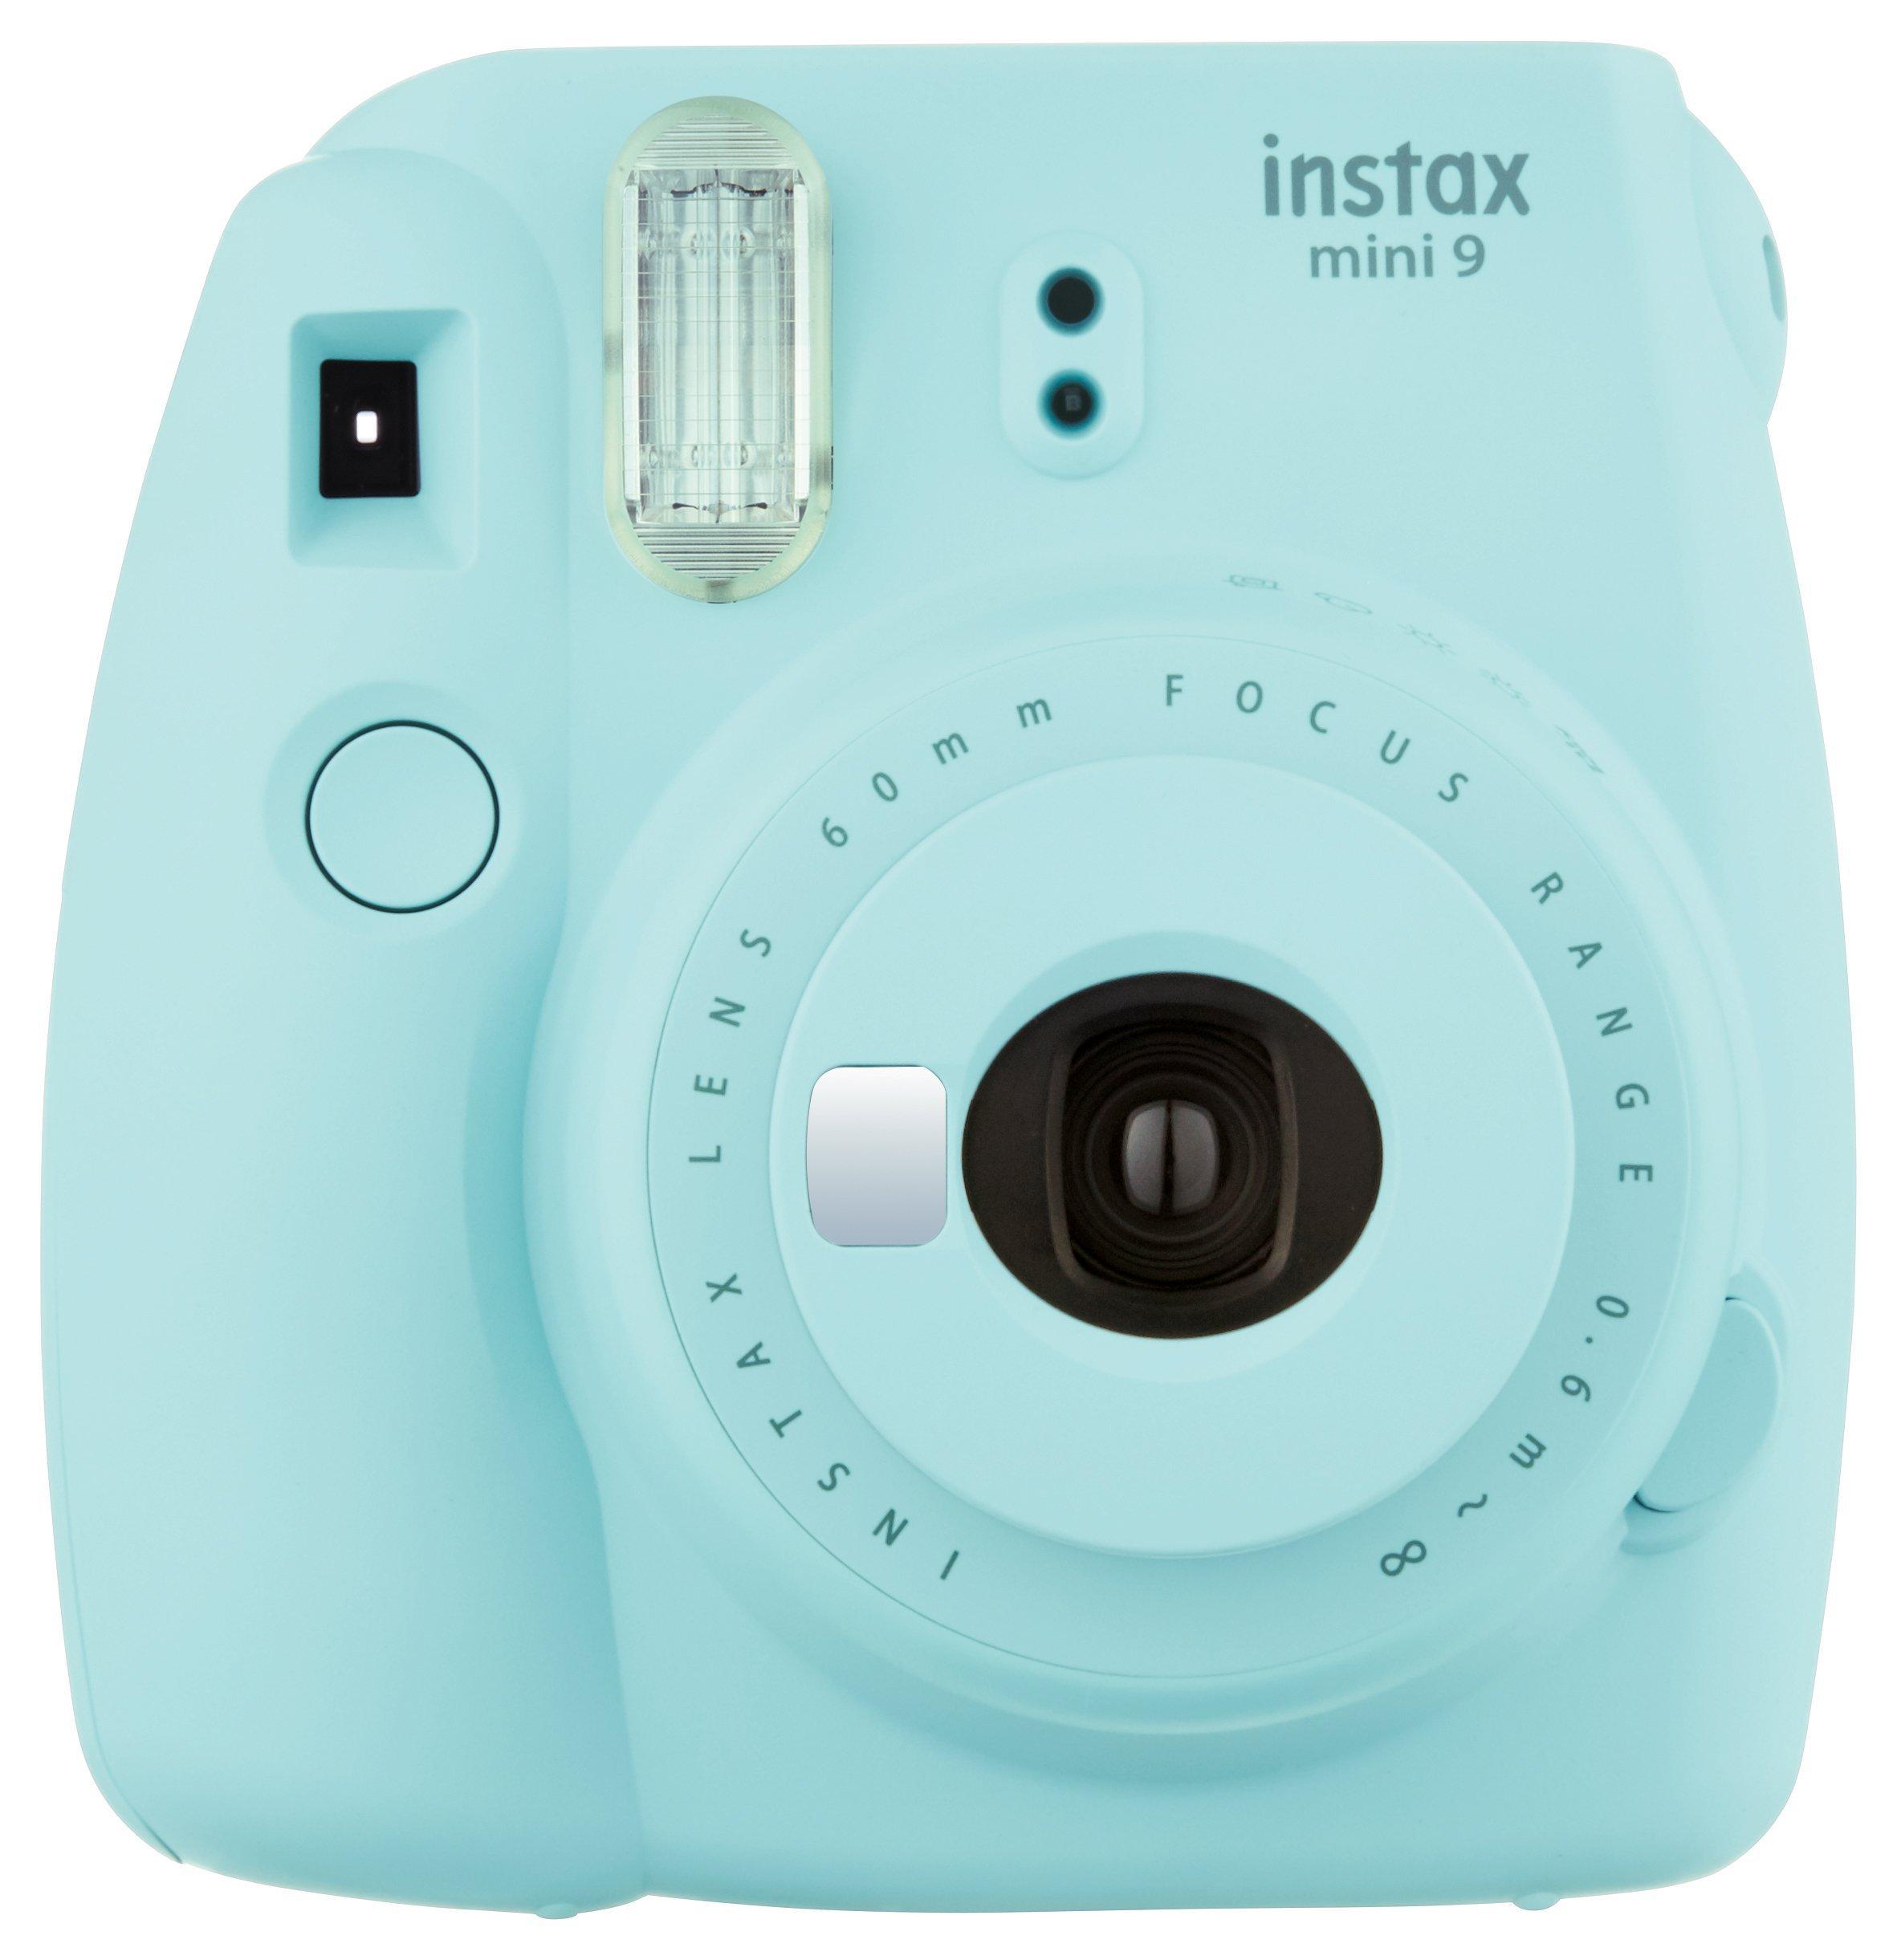 Fujifilm Instax Mini 9 Instant Camera - Ice Blue by Fujifilm